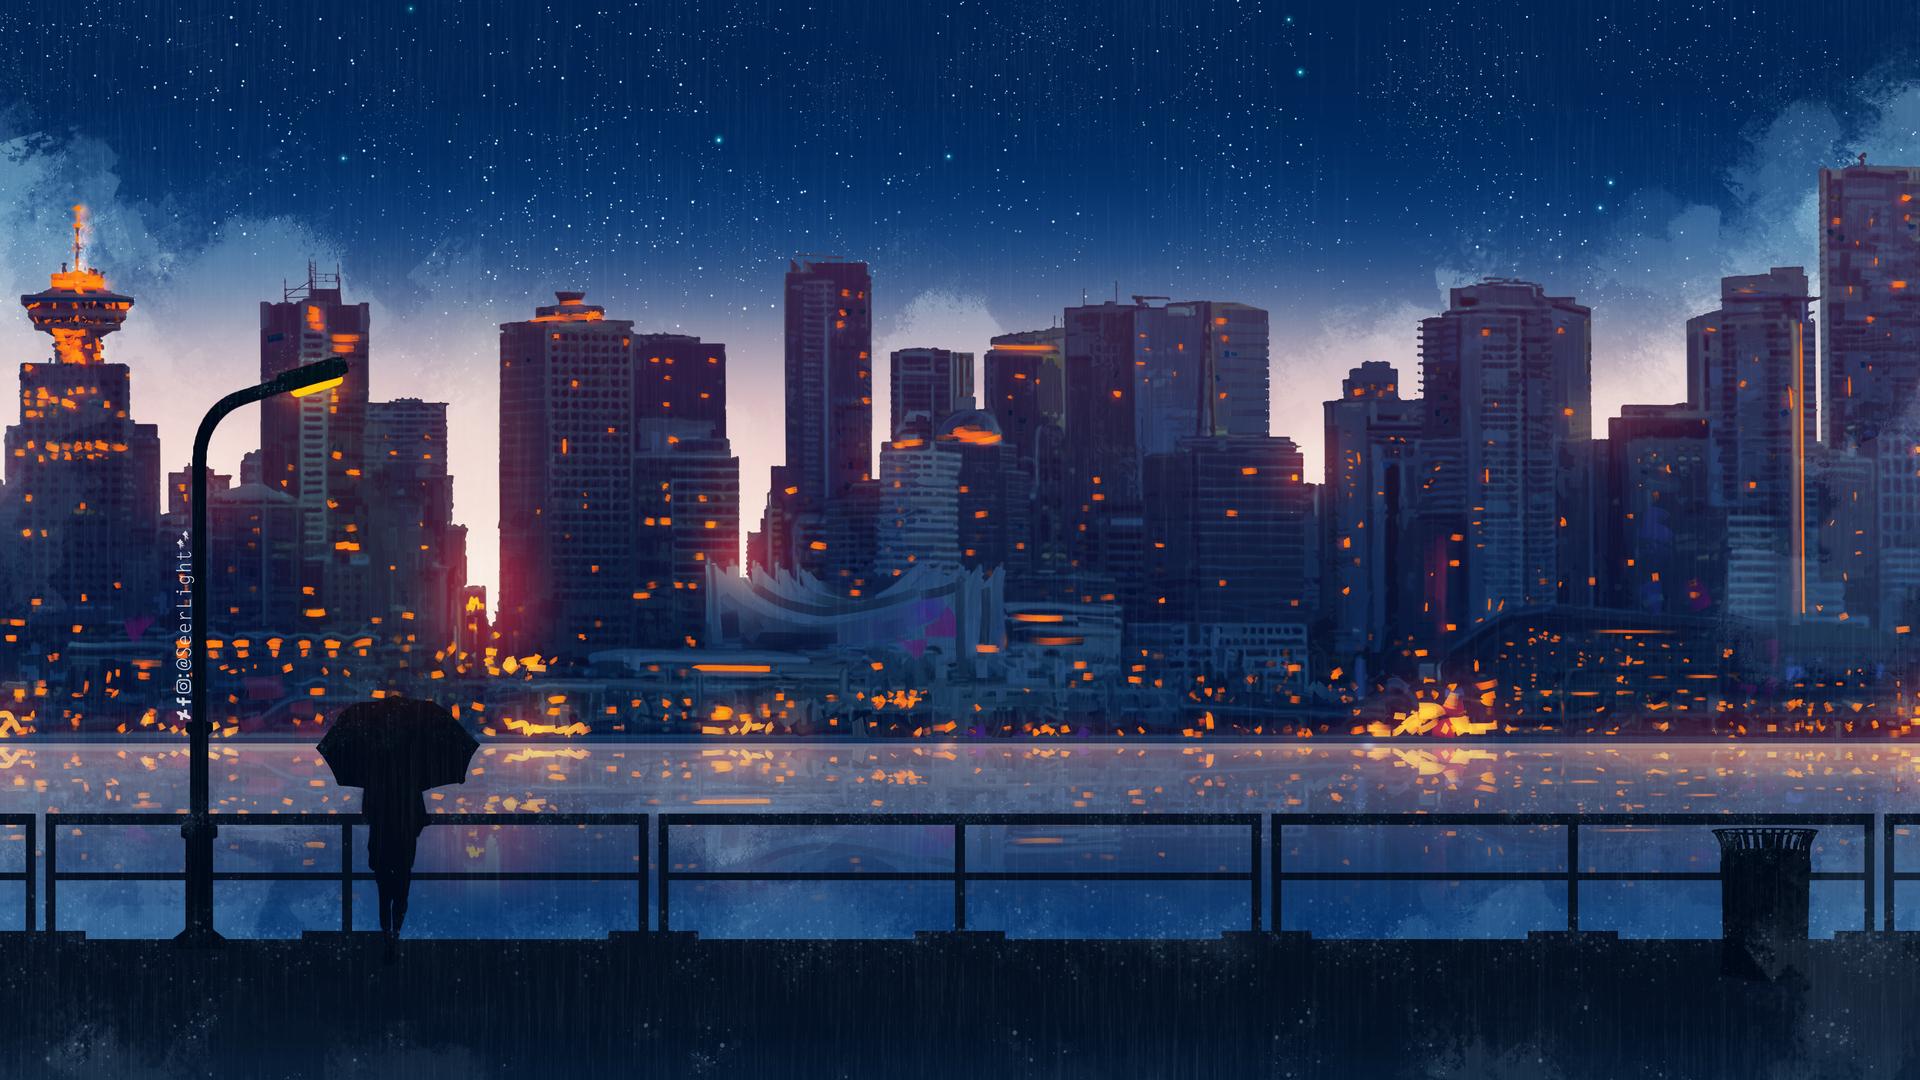 1920x1080 Wallpaper Anime City Anime Wallpapers